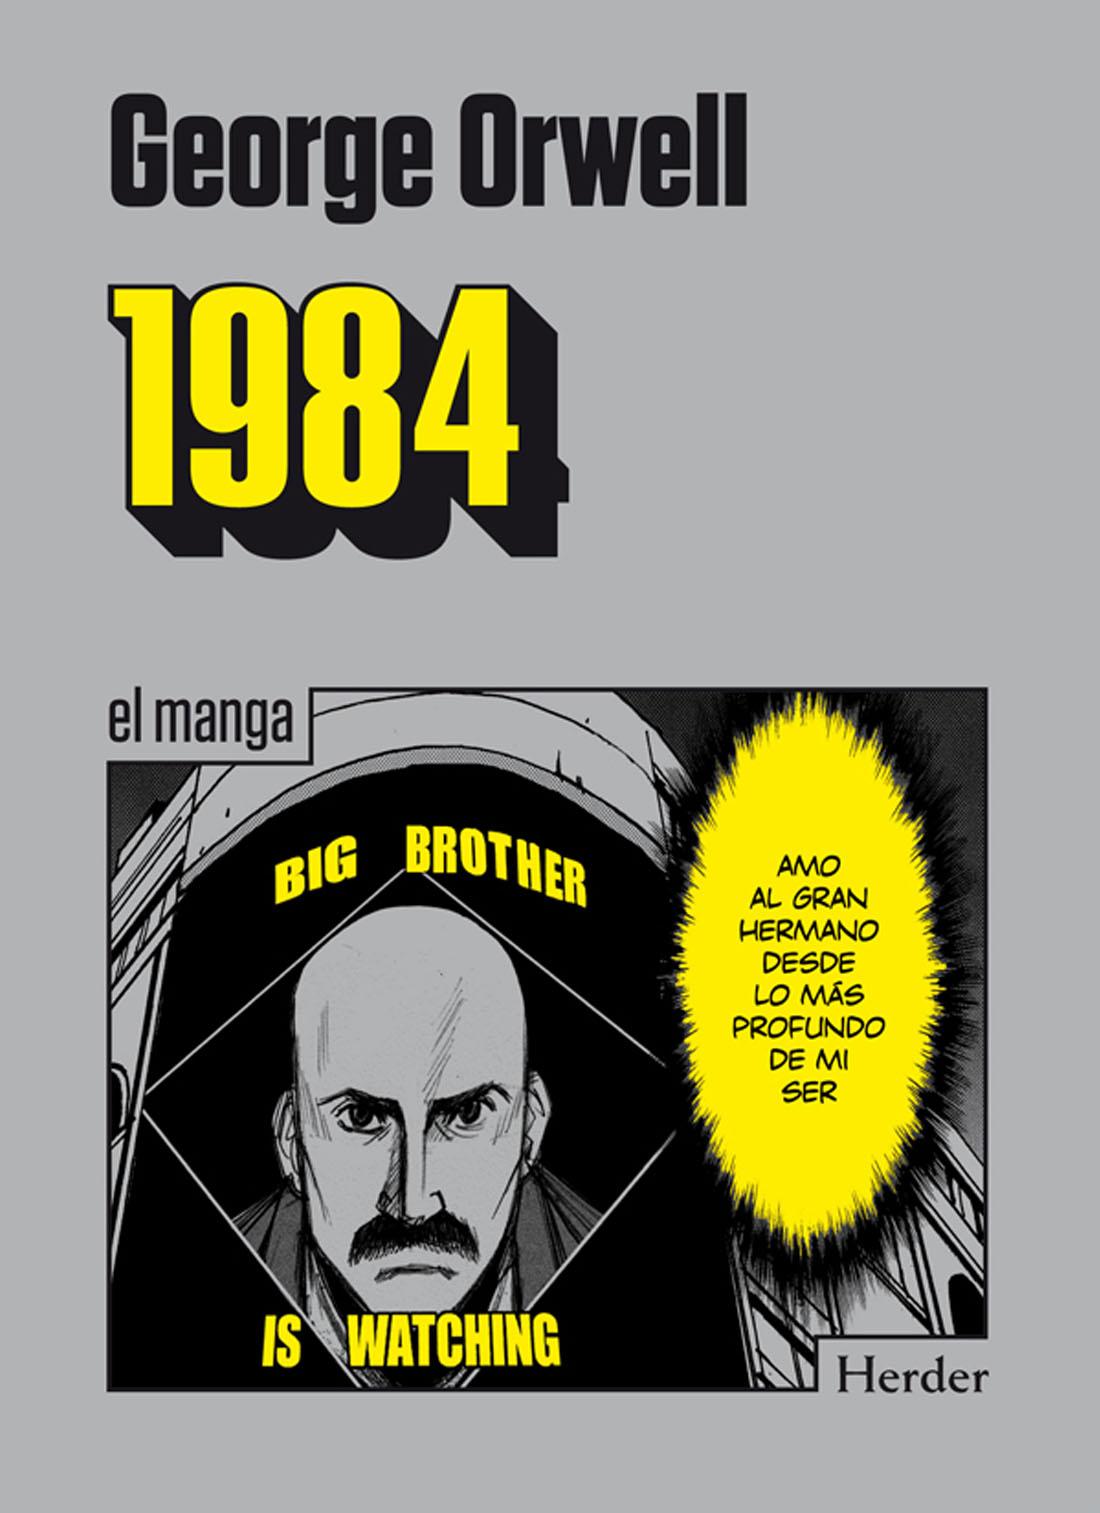 2014, de George Orwell